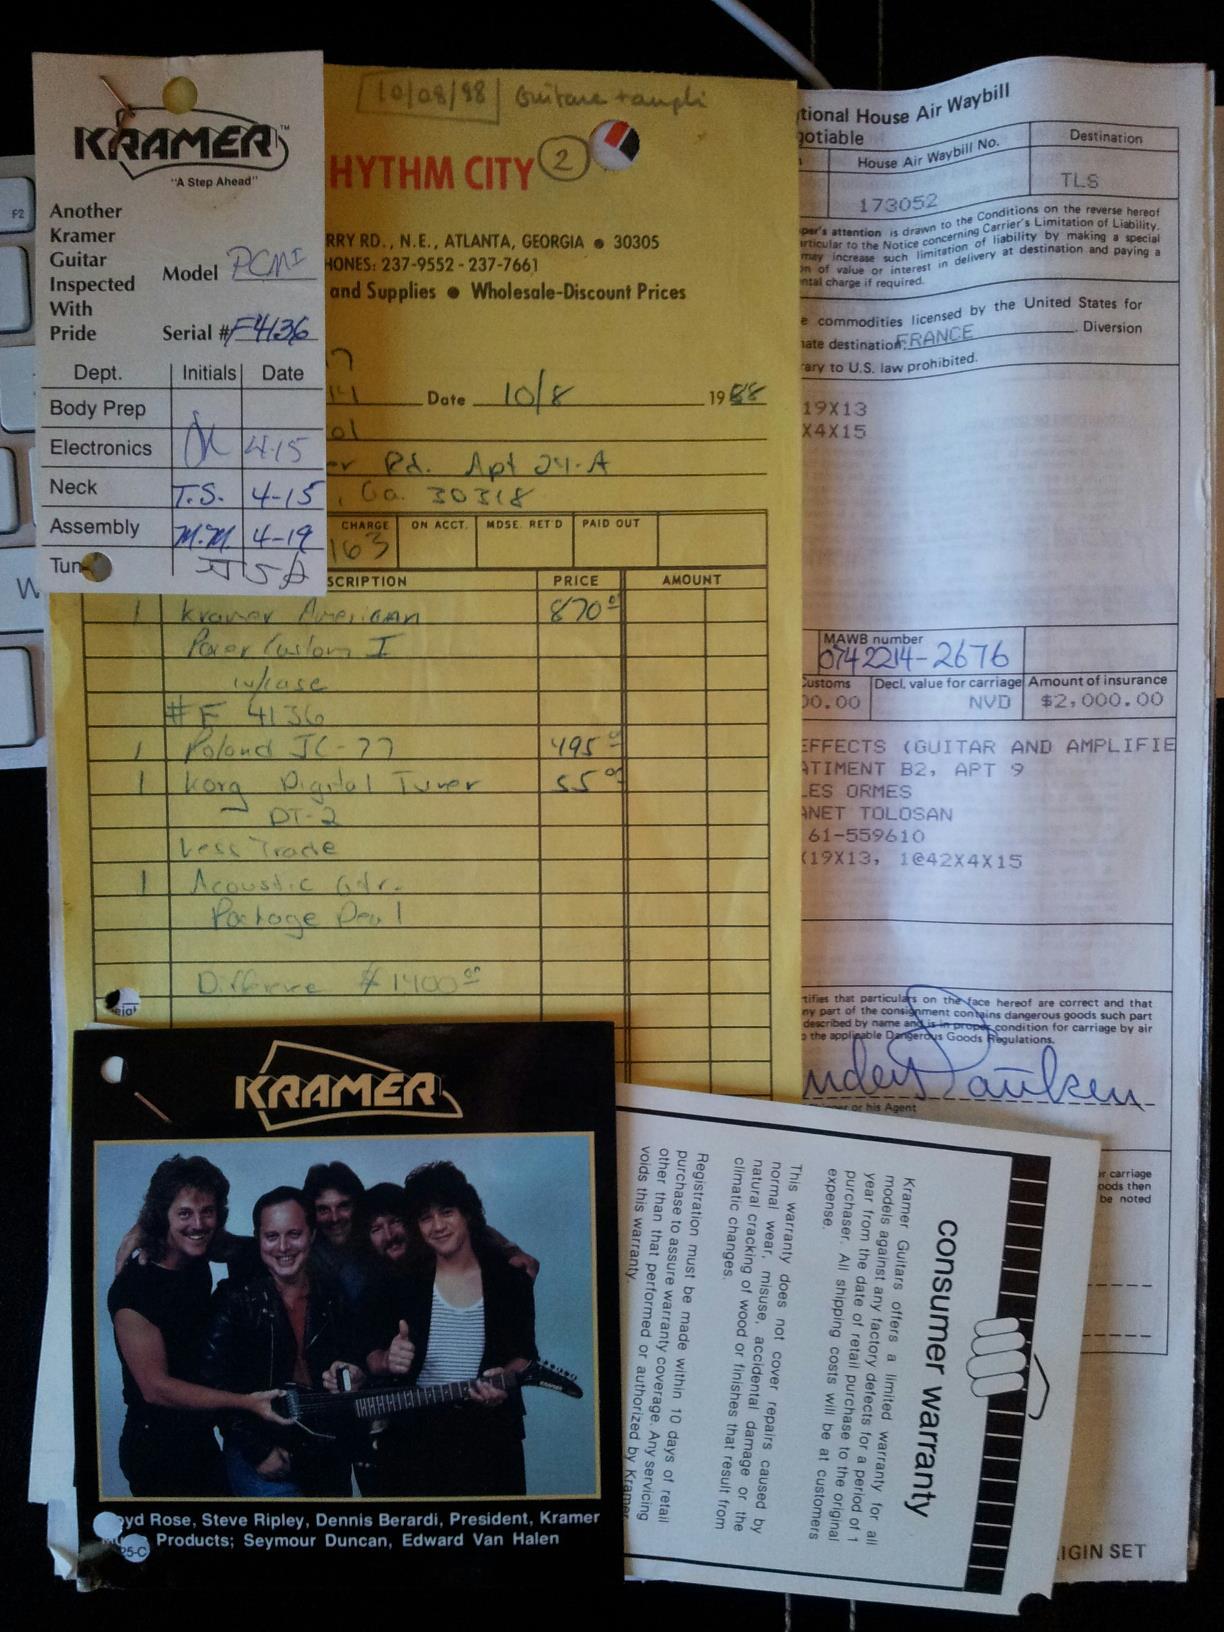 Kramer forever !!! Pacer Custom 1 in Flip Flop Red !!! 94714717861145131184401701410064135o